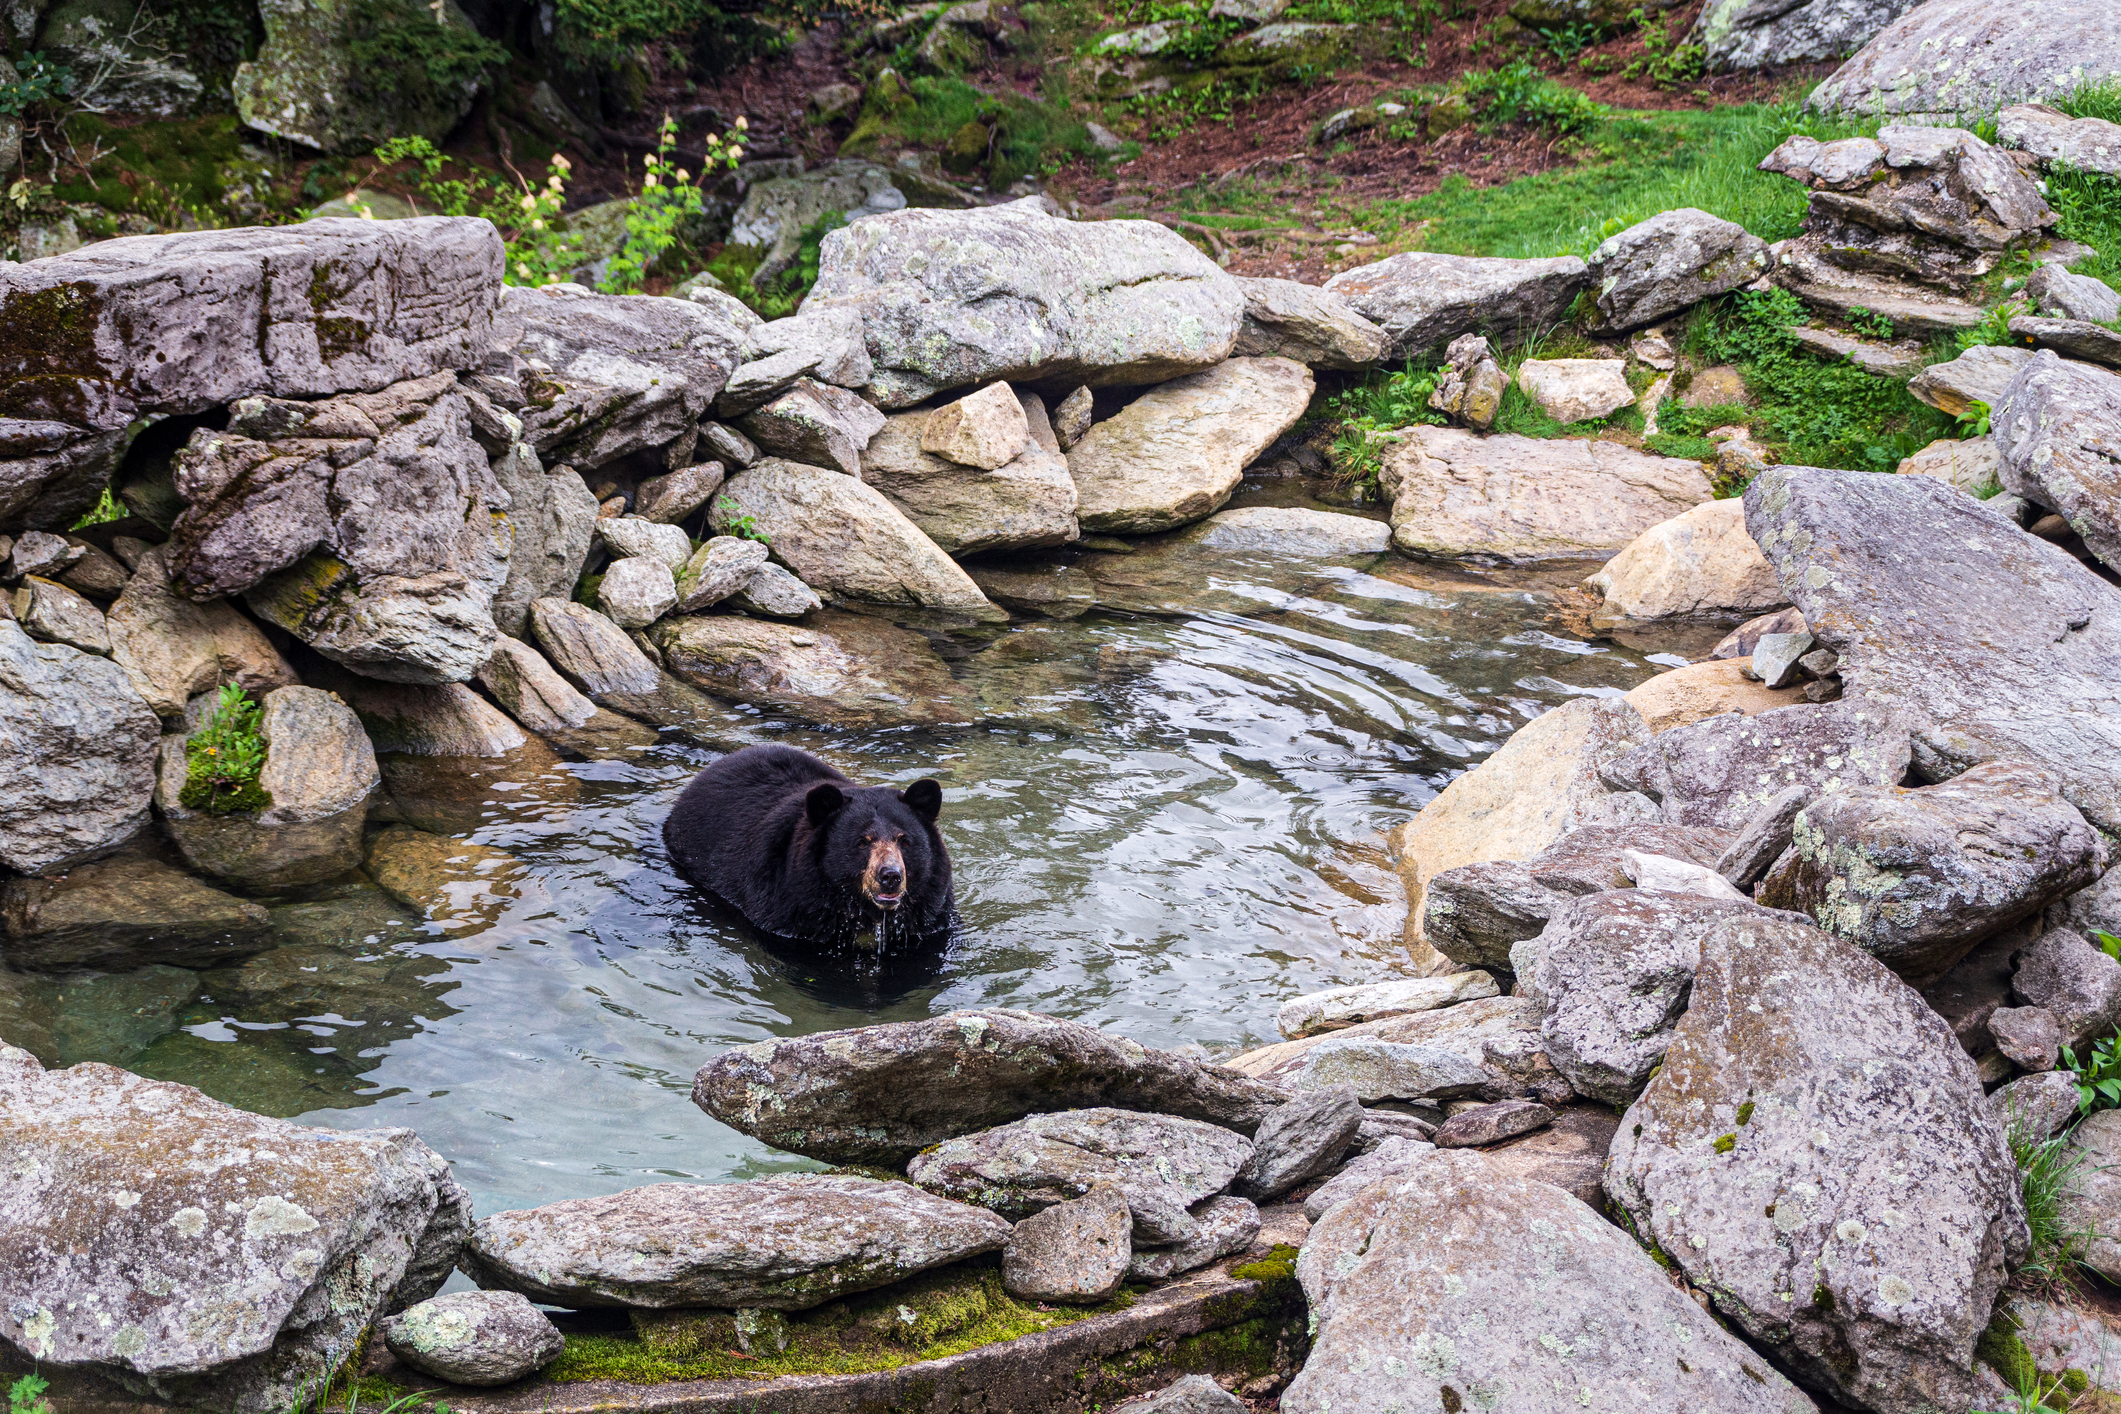 Black bear playing in a rock pool